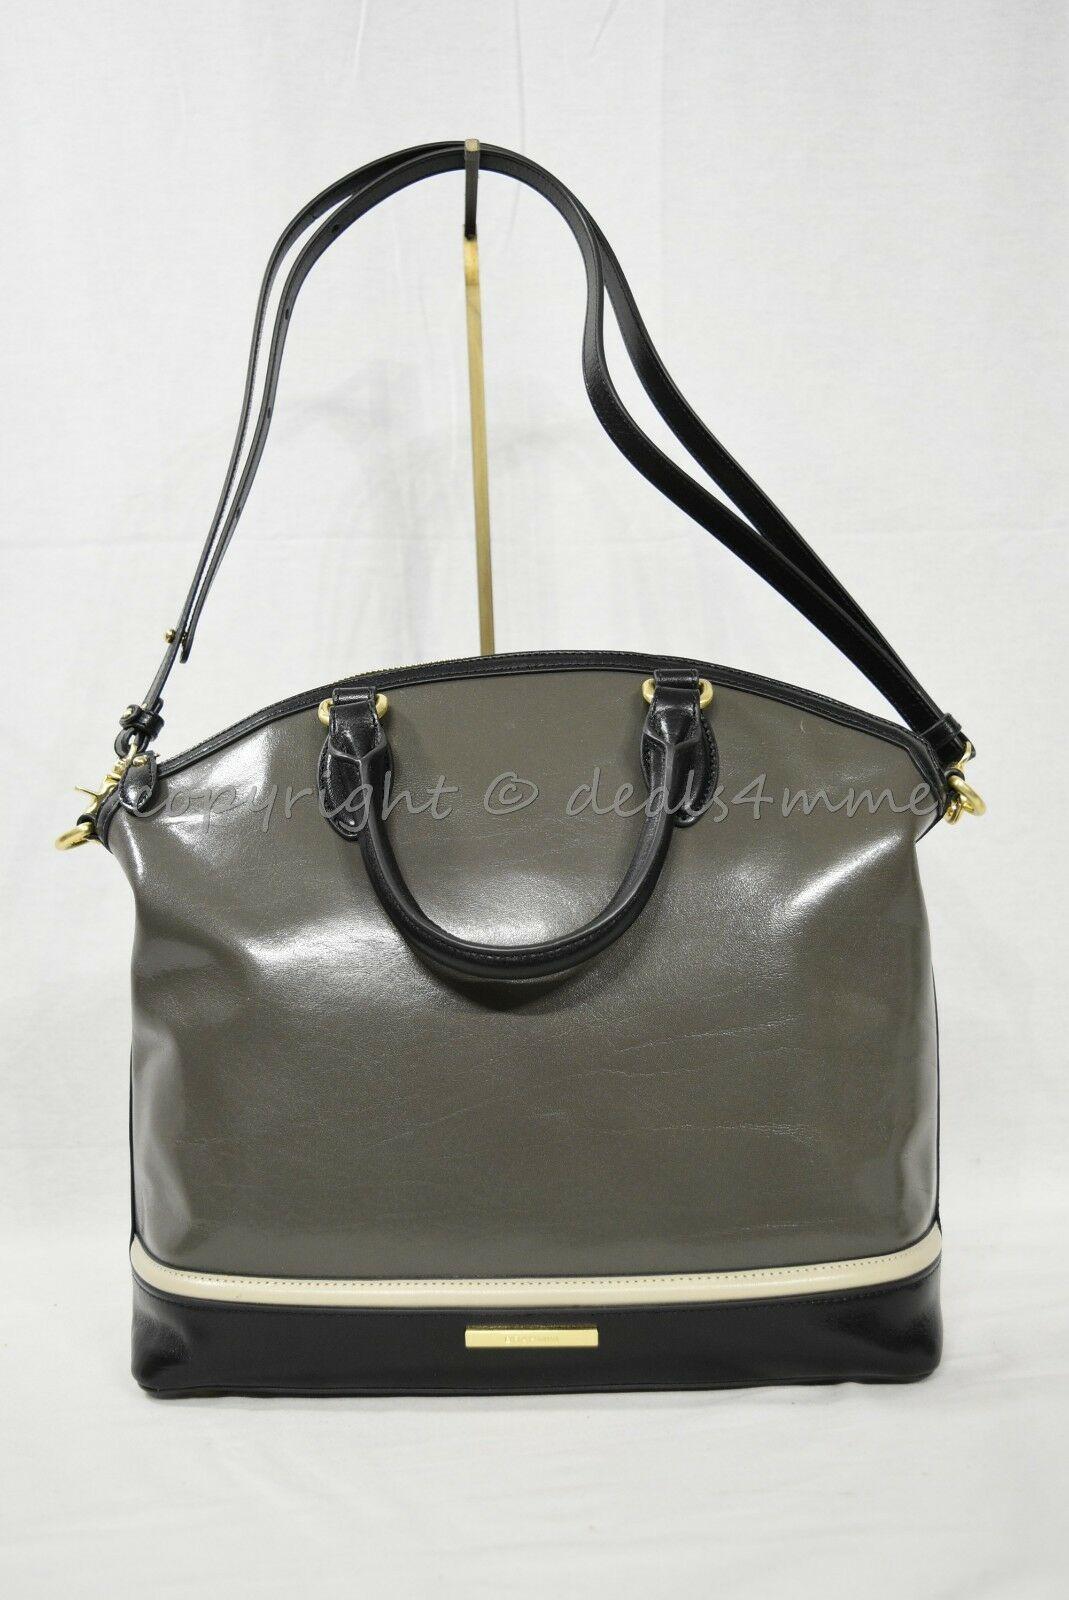 NWD Brahmin Large Duxbury Satchel/Shoulder Bag in Charcoal Westport image 3